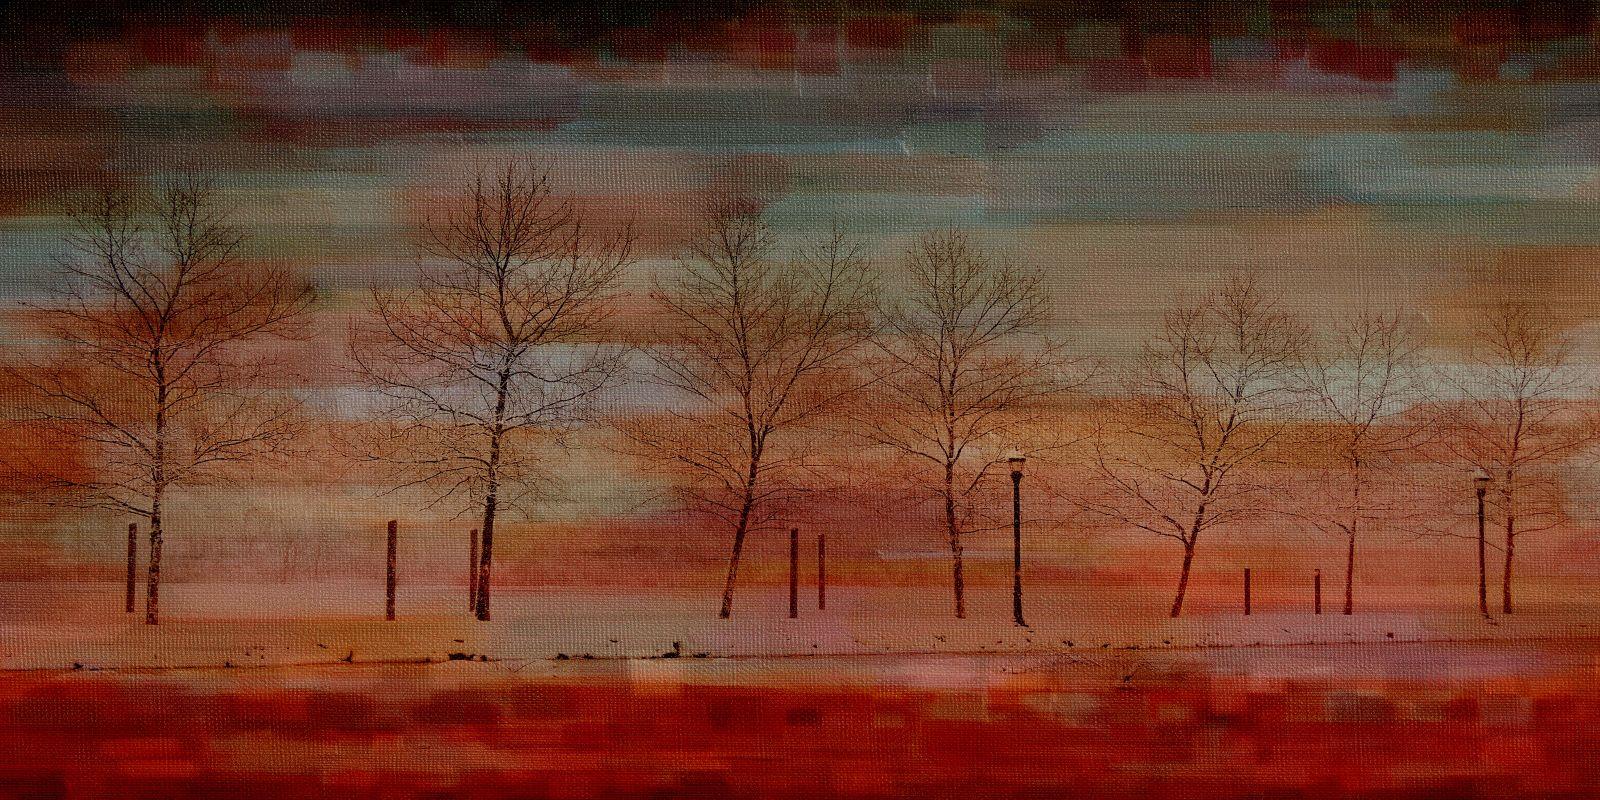 Parvez Taj Deep Red View Art Print on Premium Canvas 18 x 36 Home